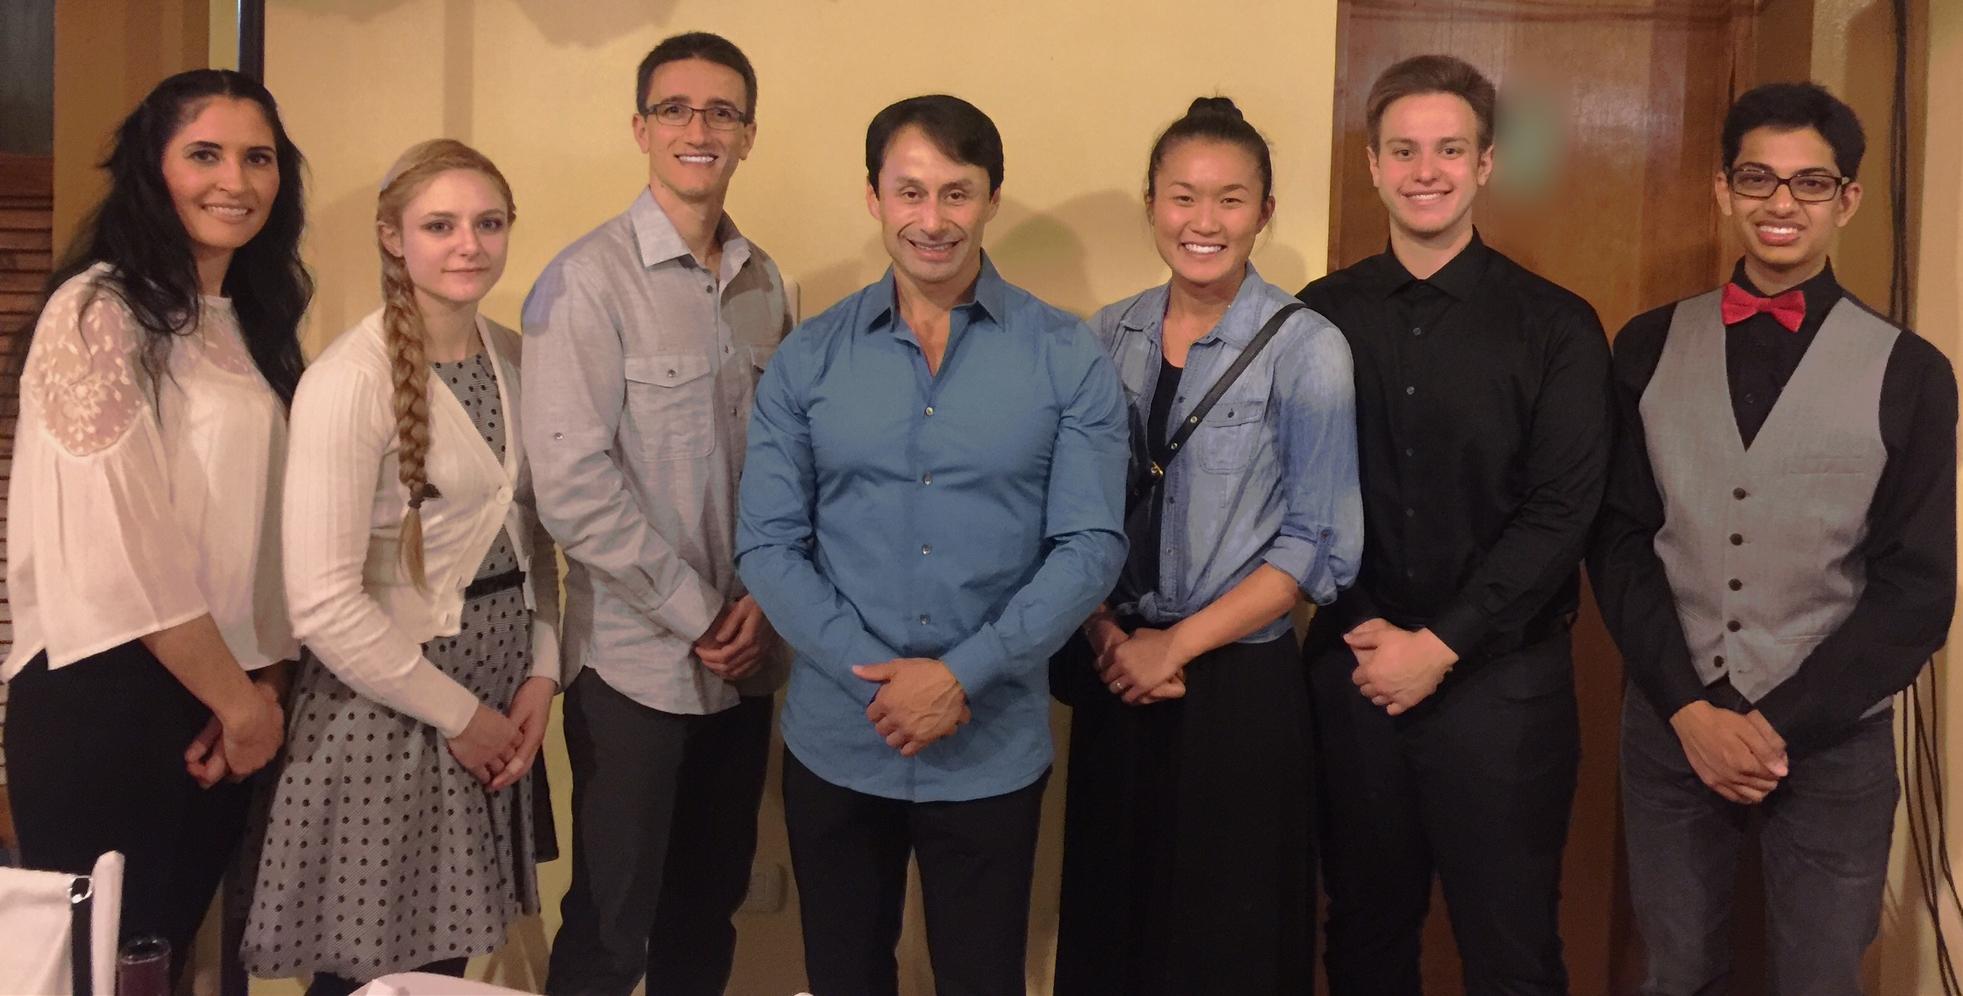 Master John Ozuna, David Curran, Ashley Dong, Katie Schmid, Mark O'Neill, Heather Kinzie, and Pratyush Sridhar at the post-tournament banquet (2015)